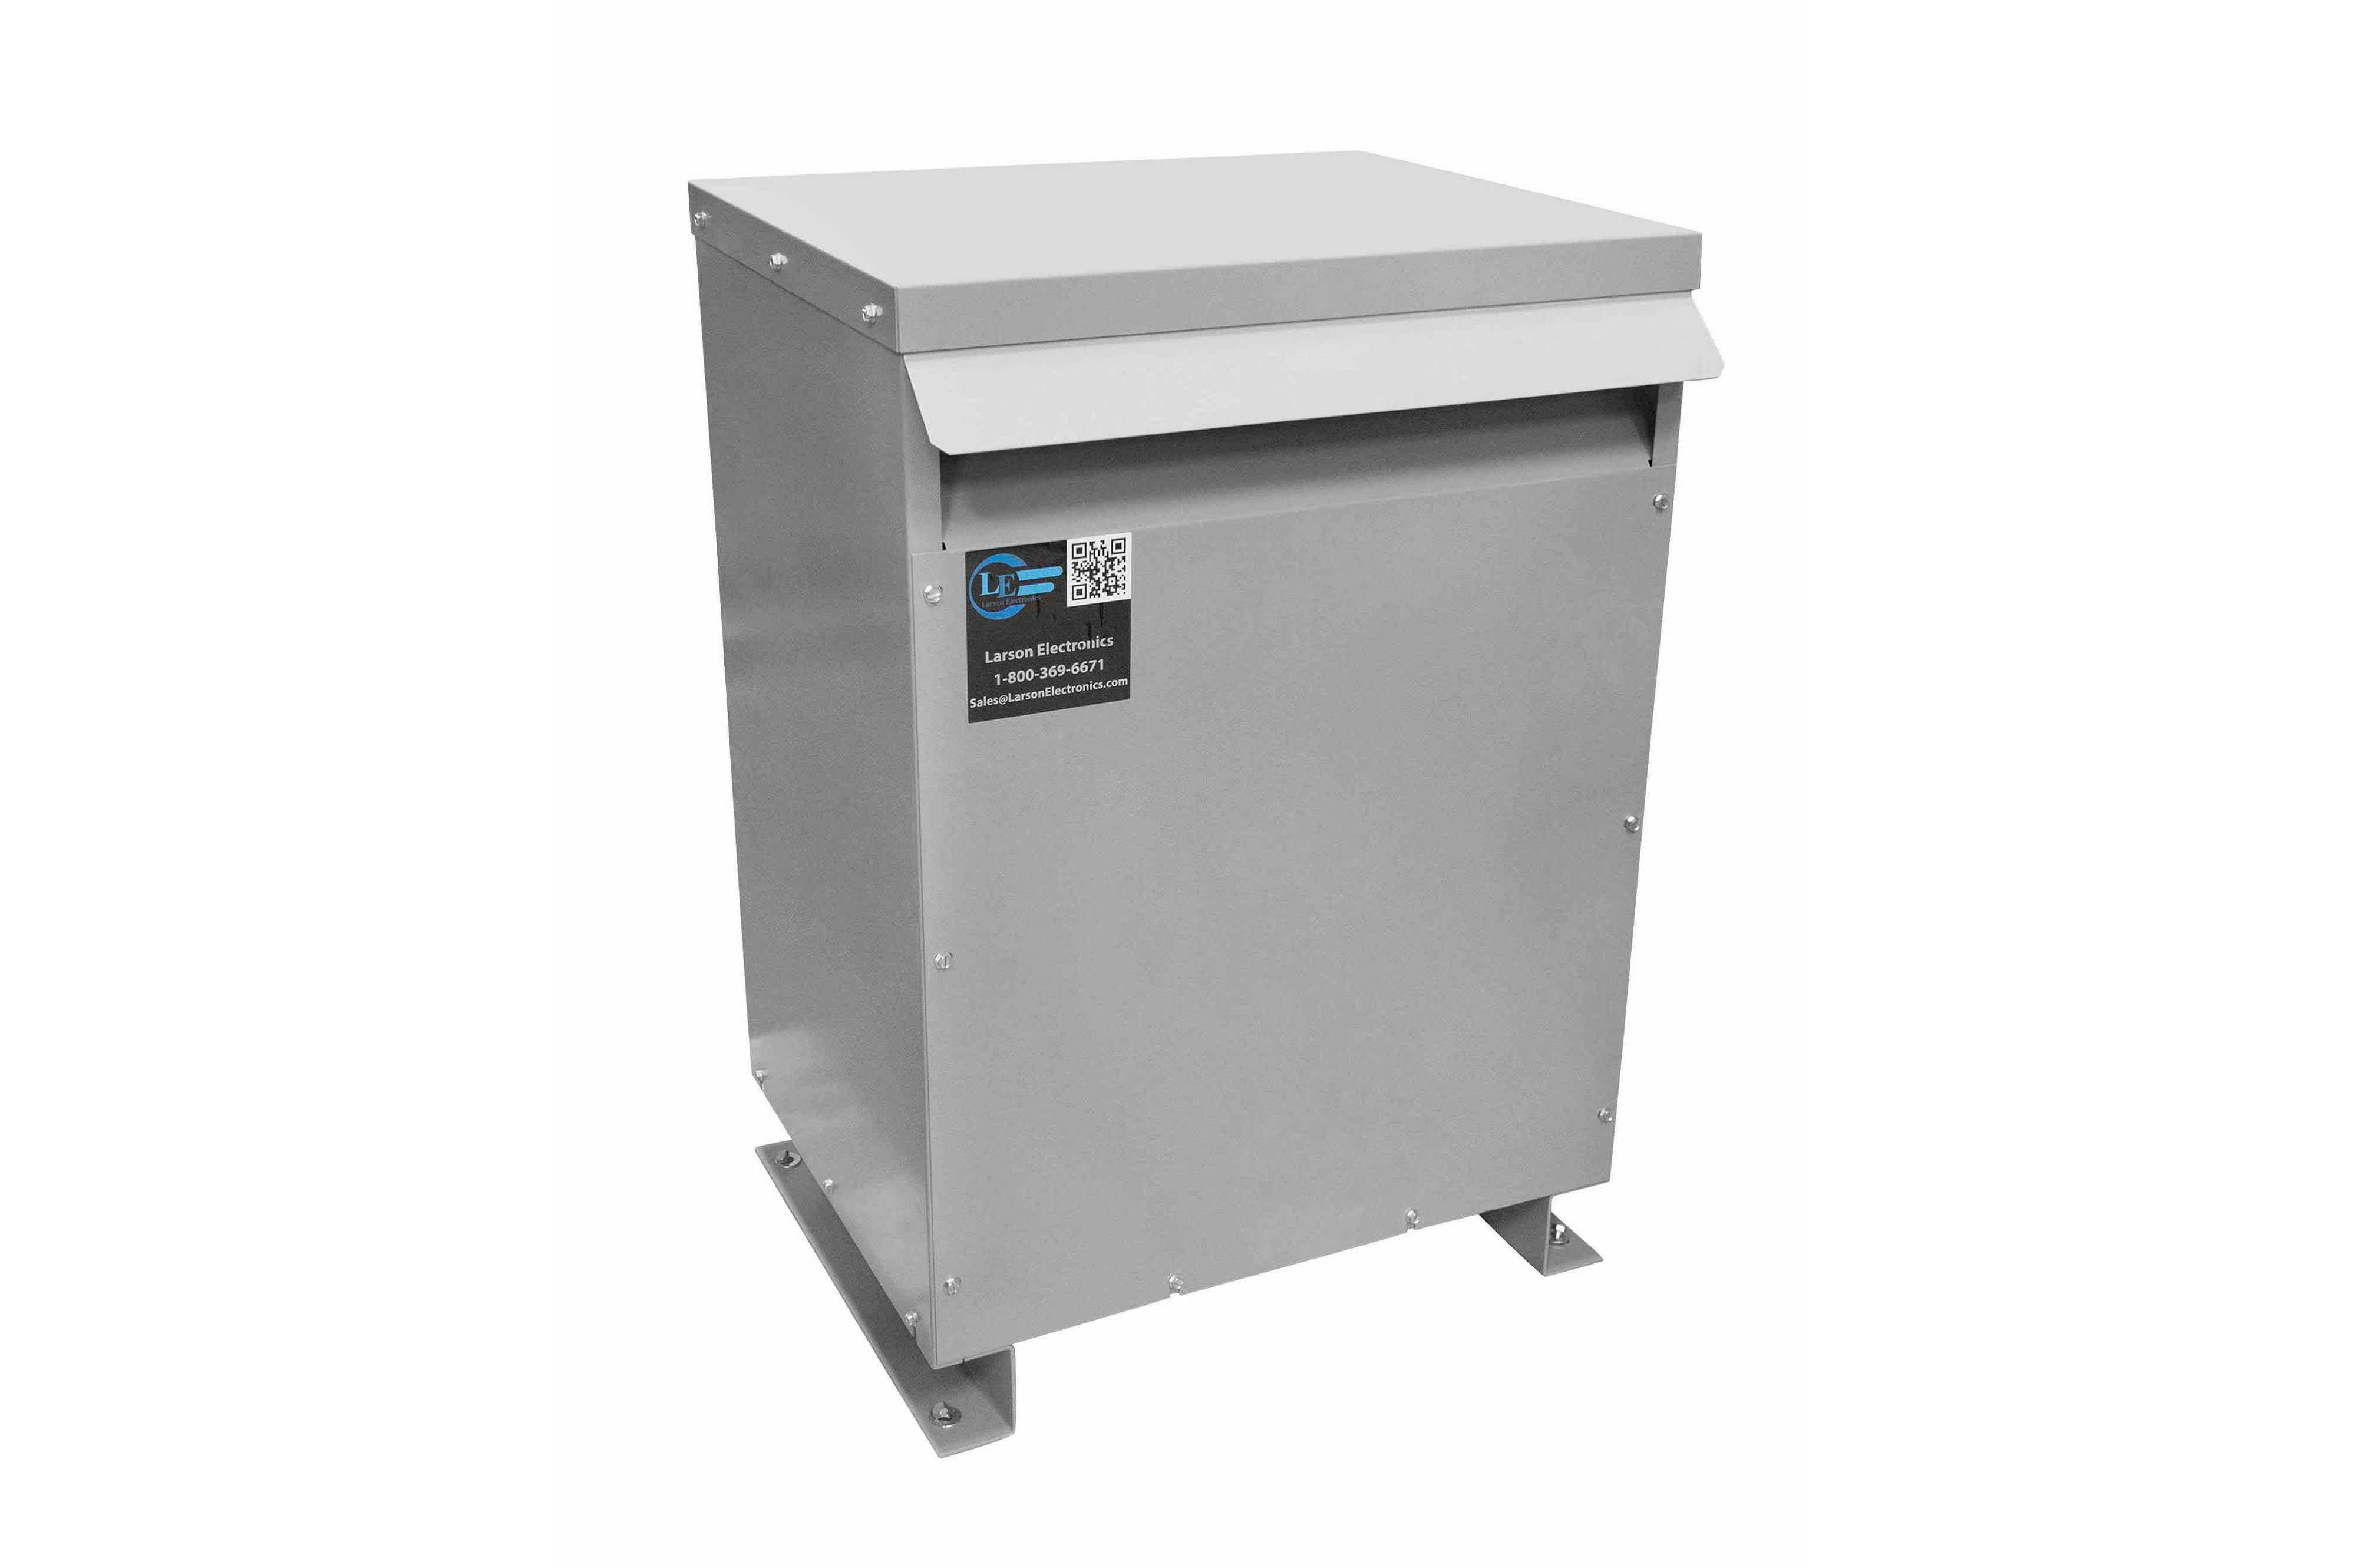 13 kVA 3PH Isolation Transformer, 230V Wye Primary, 208Y/120 Wye-N Secondary, N3R, Ventilated, 60 Hz